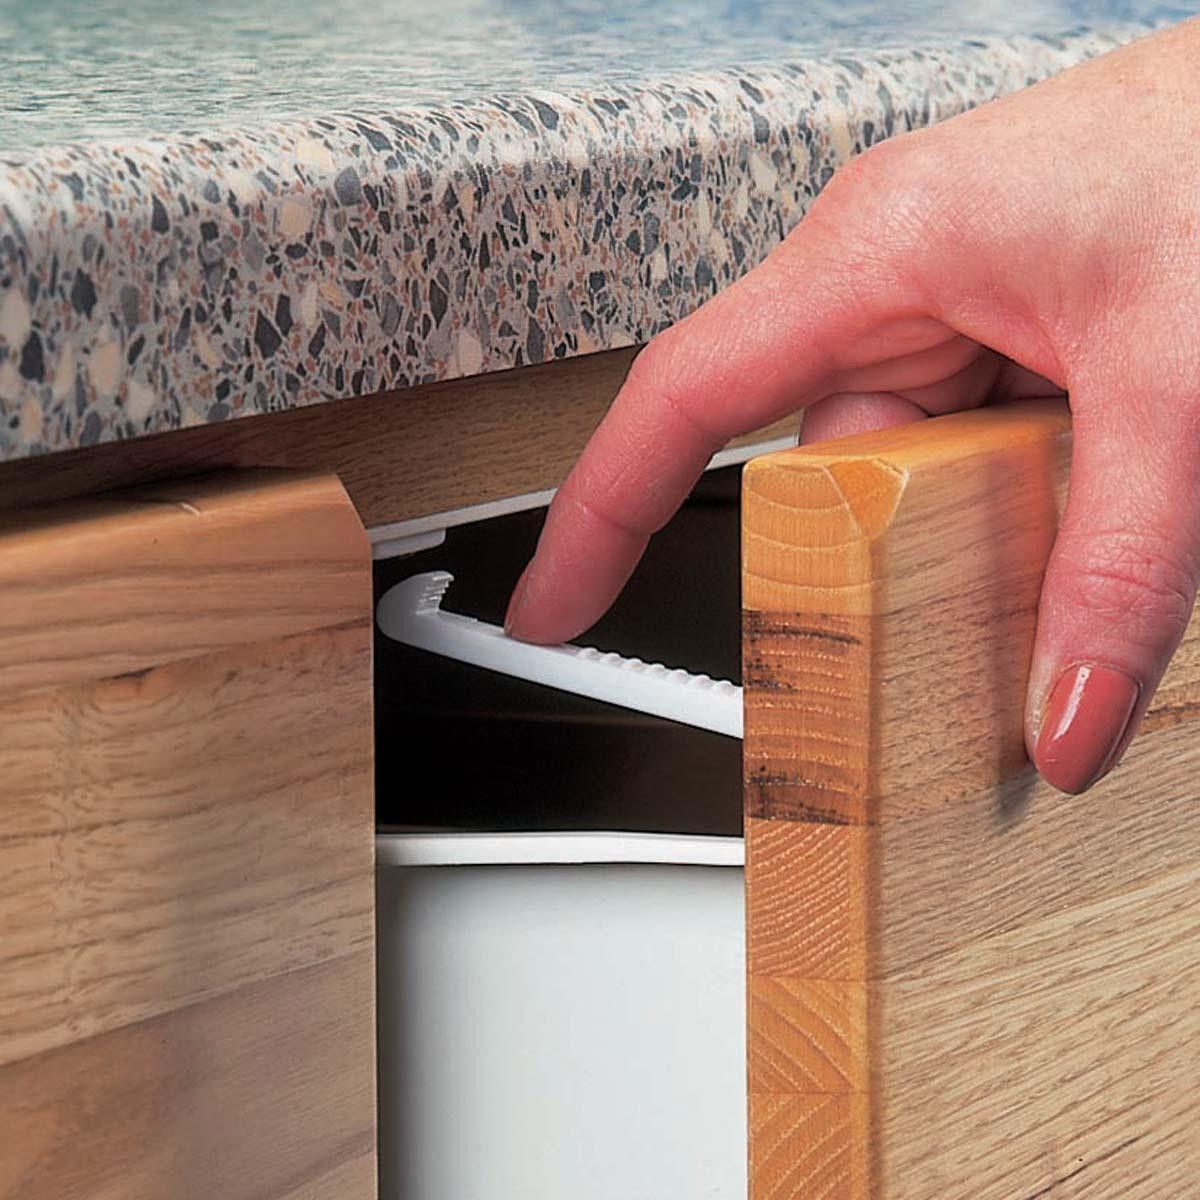 Clippasafe 6 x Cupboard Locks Home safety, Cupboard